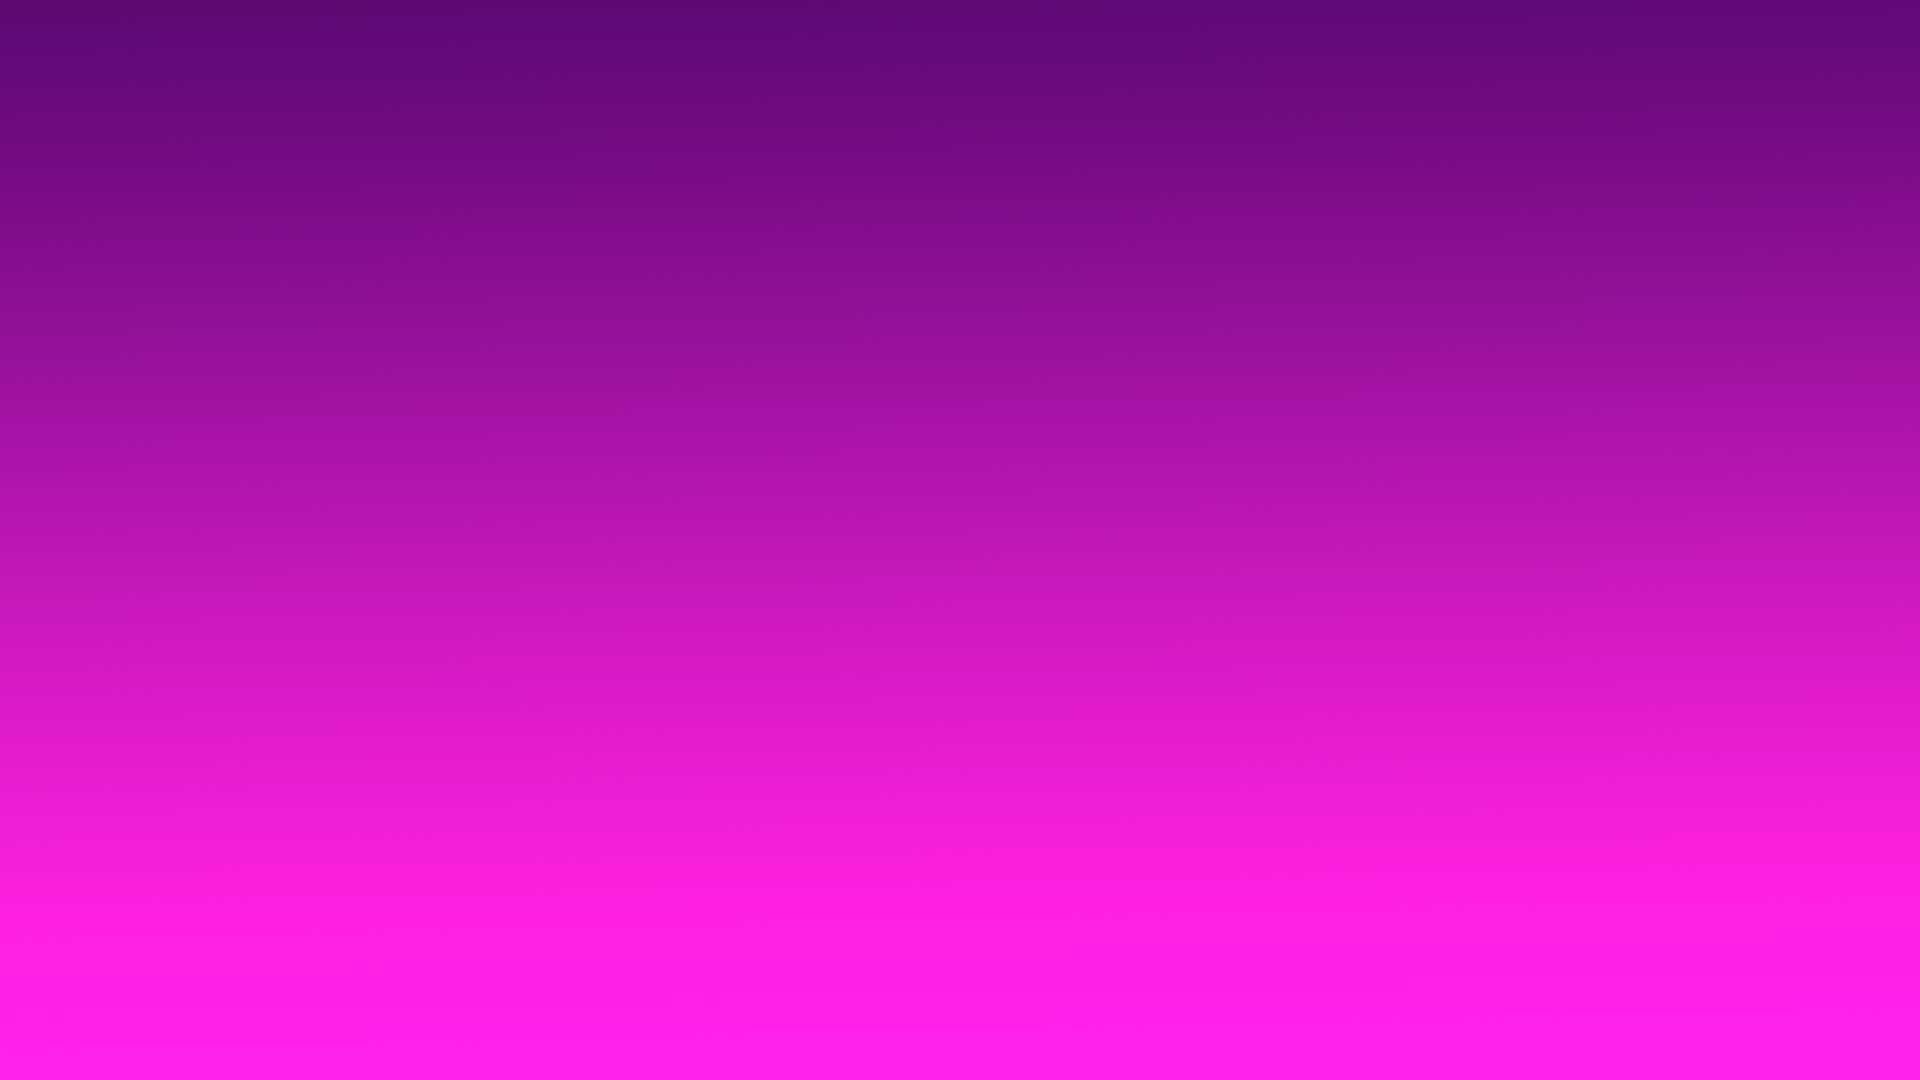 Purple Pink   EZTechTrainingcom 1920x1080